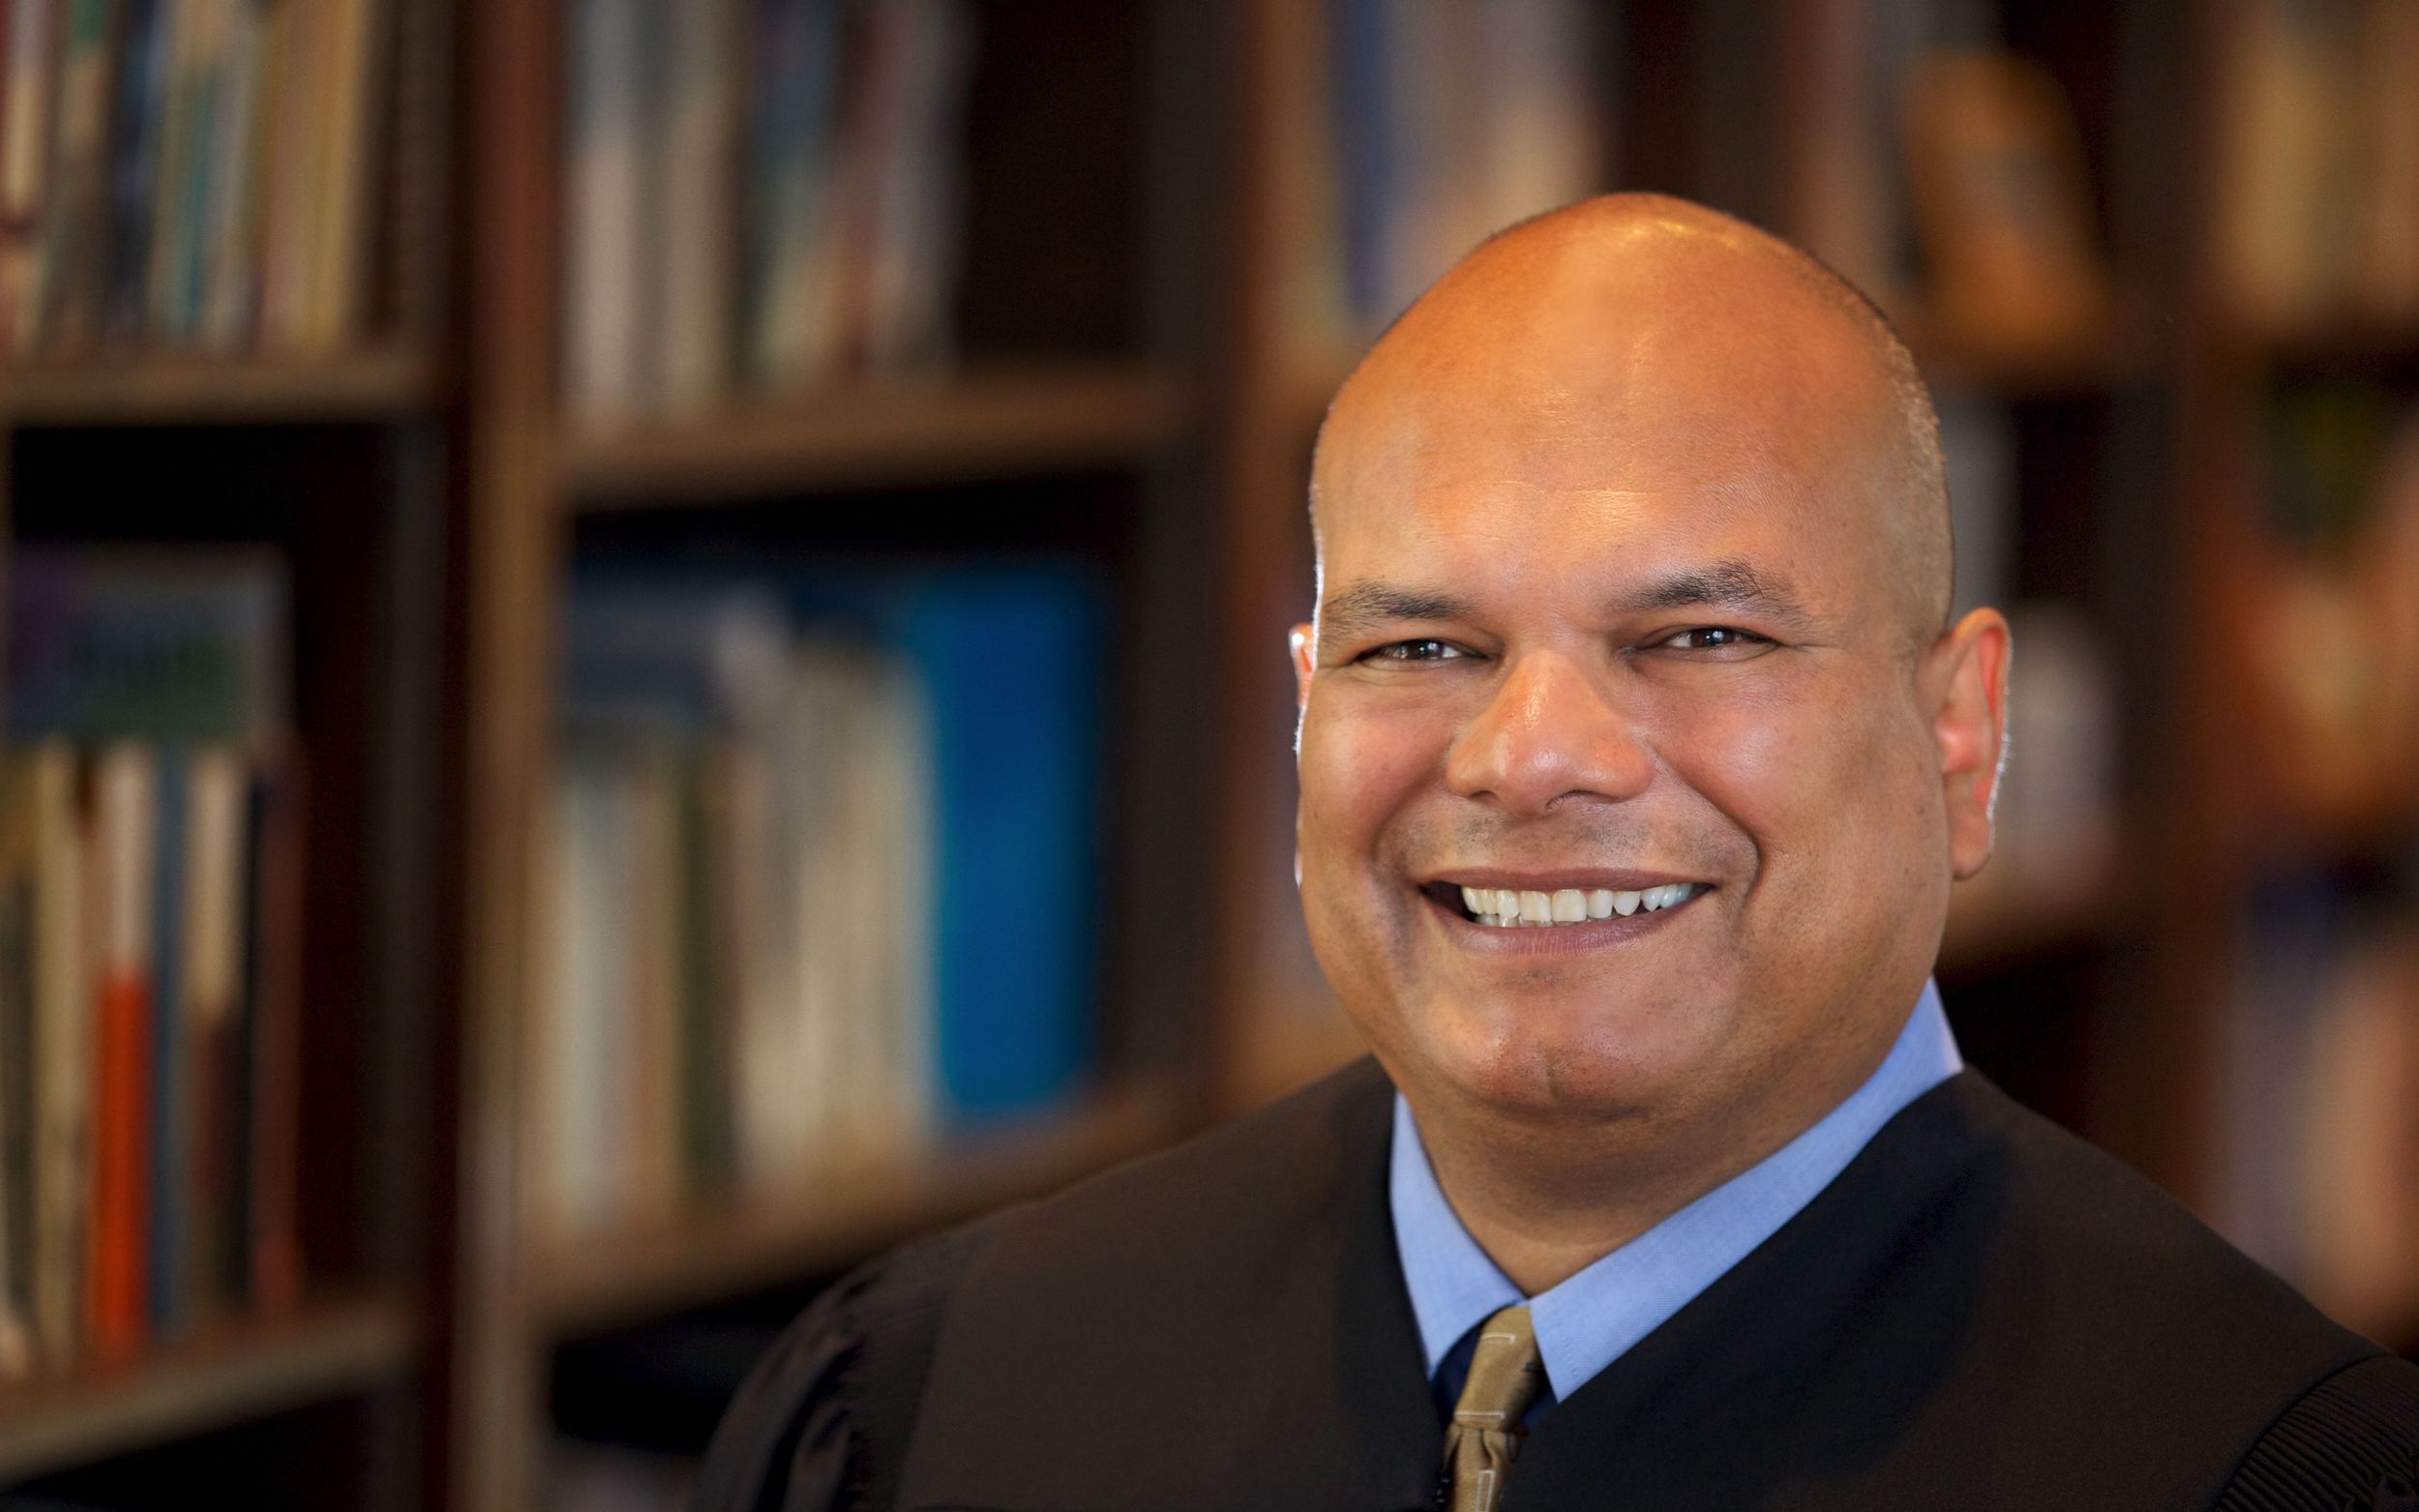 Victor M. Minjares, Owner, Minjares Law Office PLLC